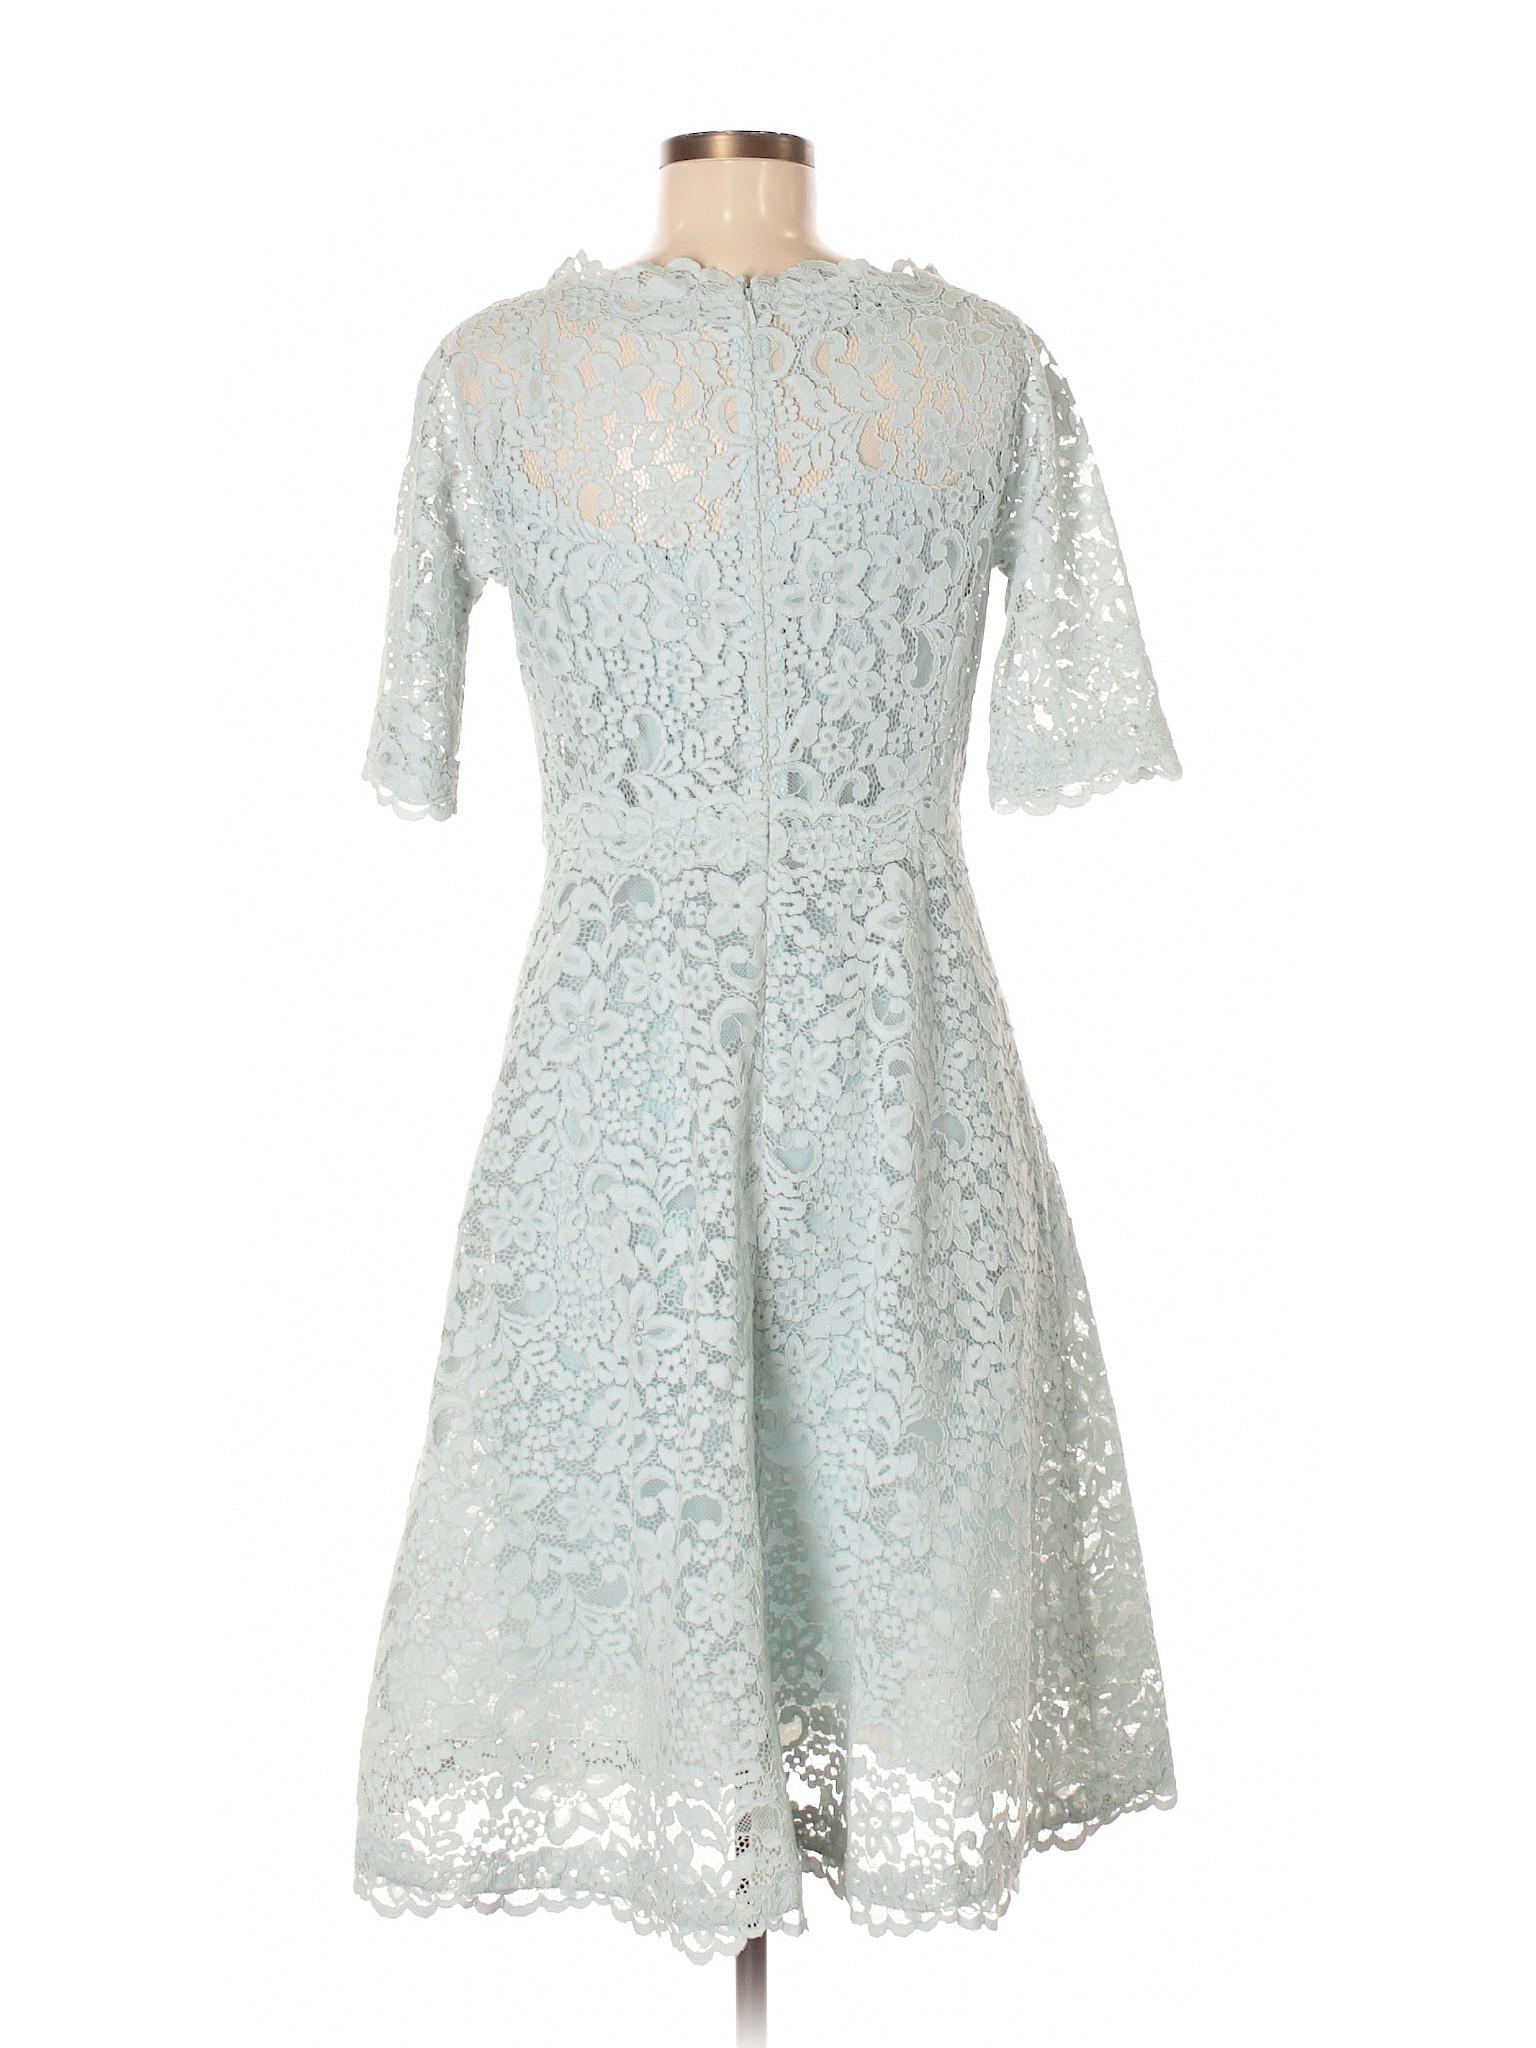 Boutique Dress by Casual Freeman Teri winter Rickie Jon 1qvr1Z0